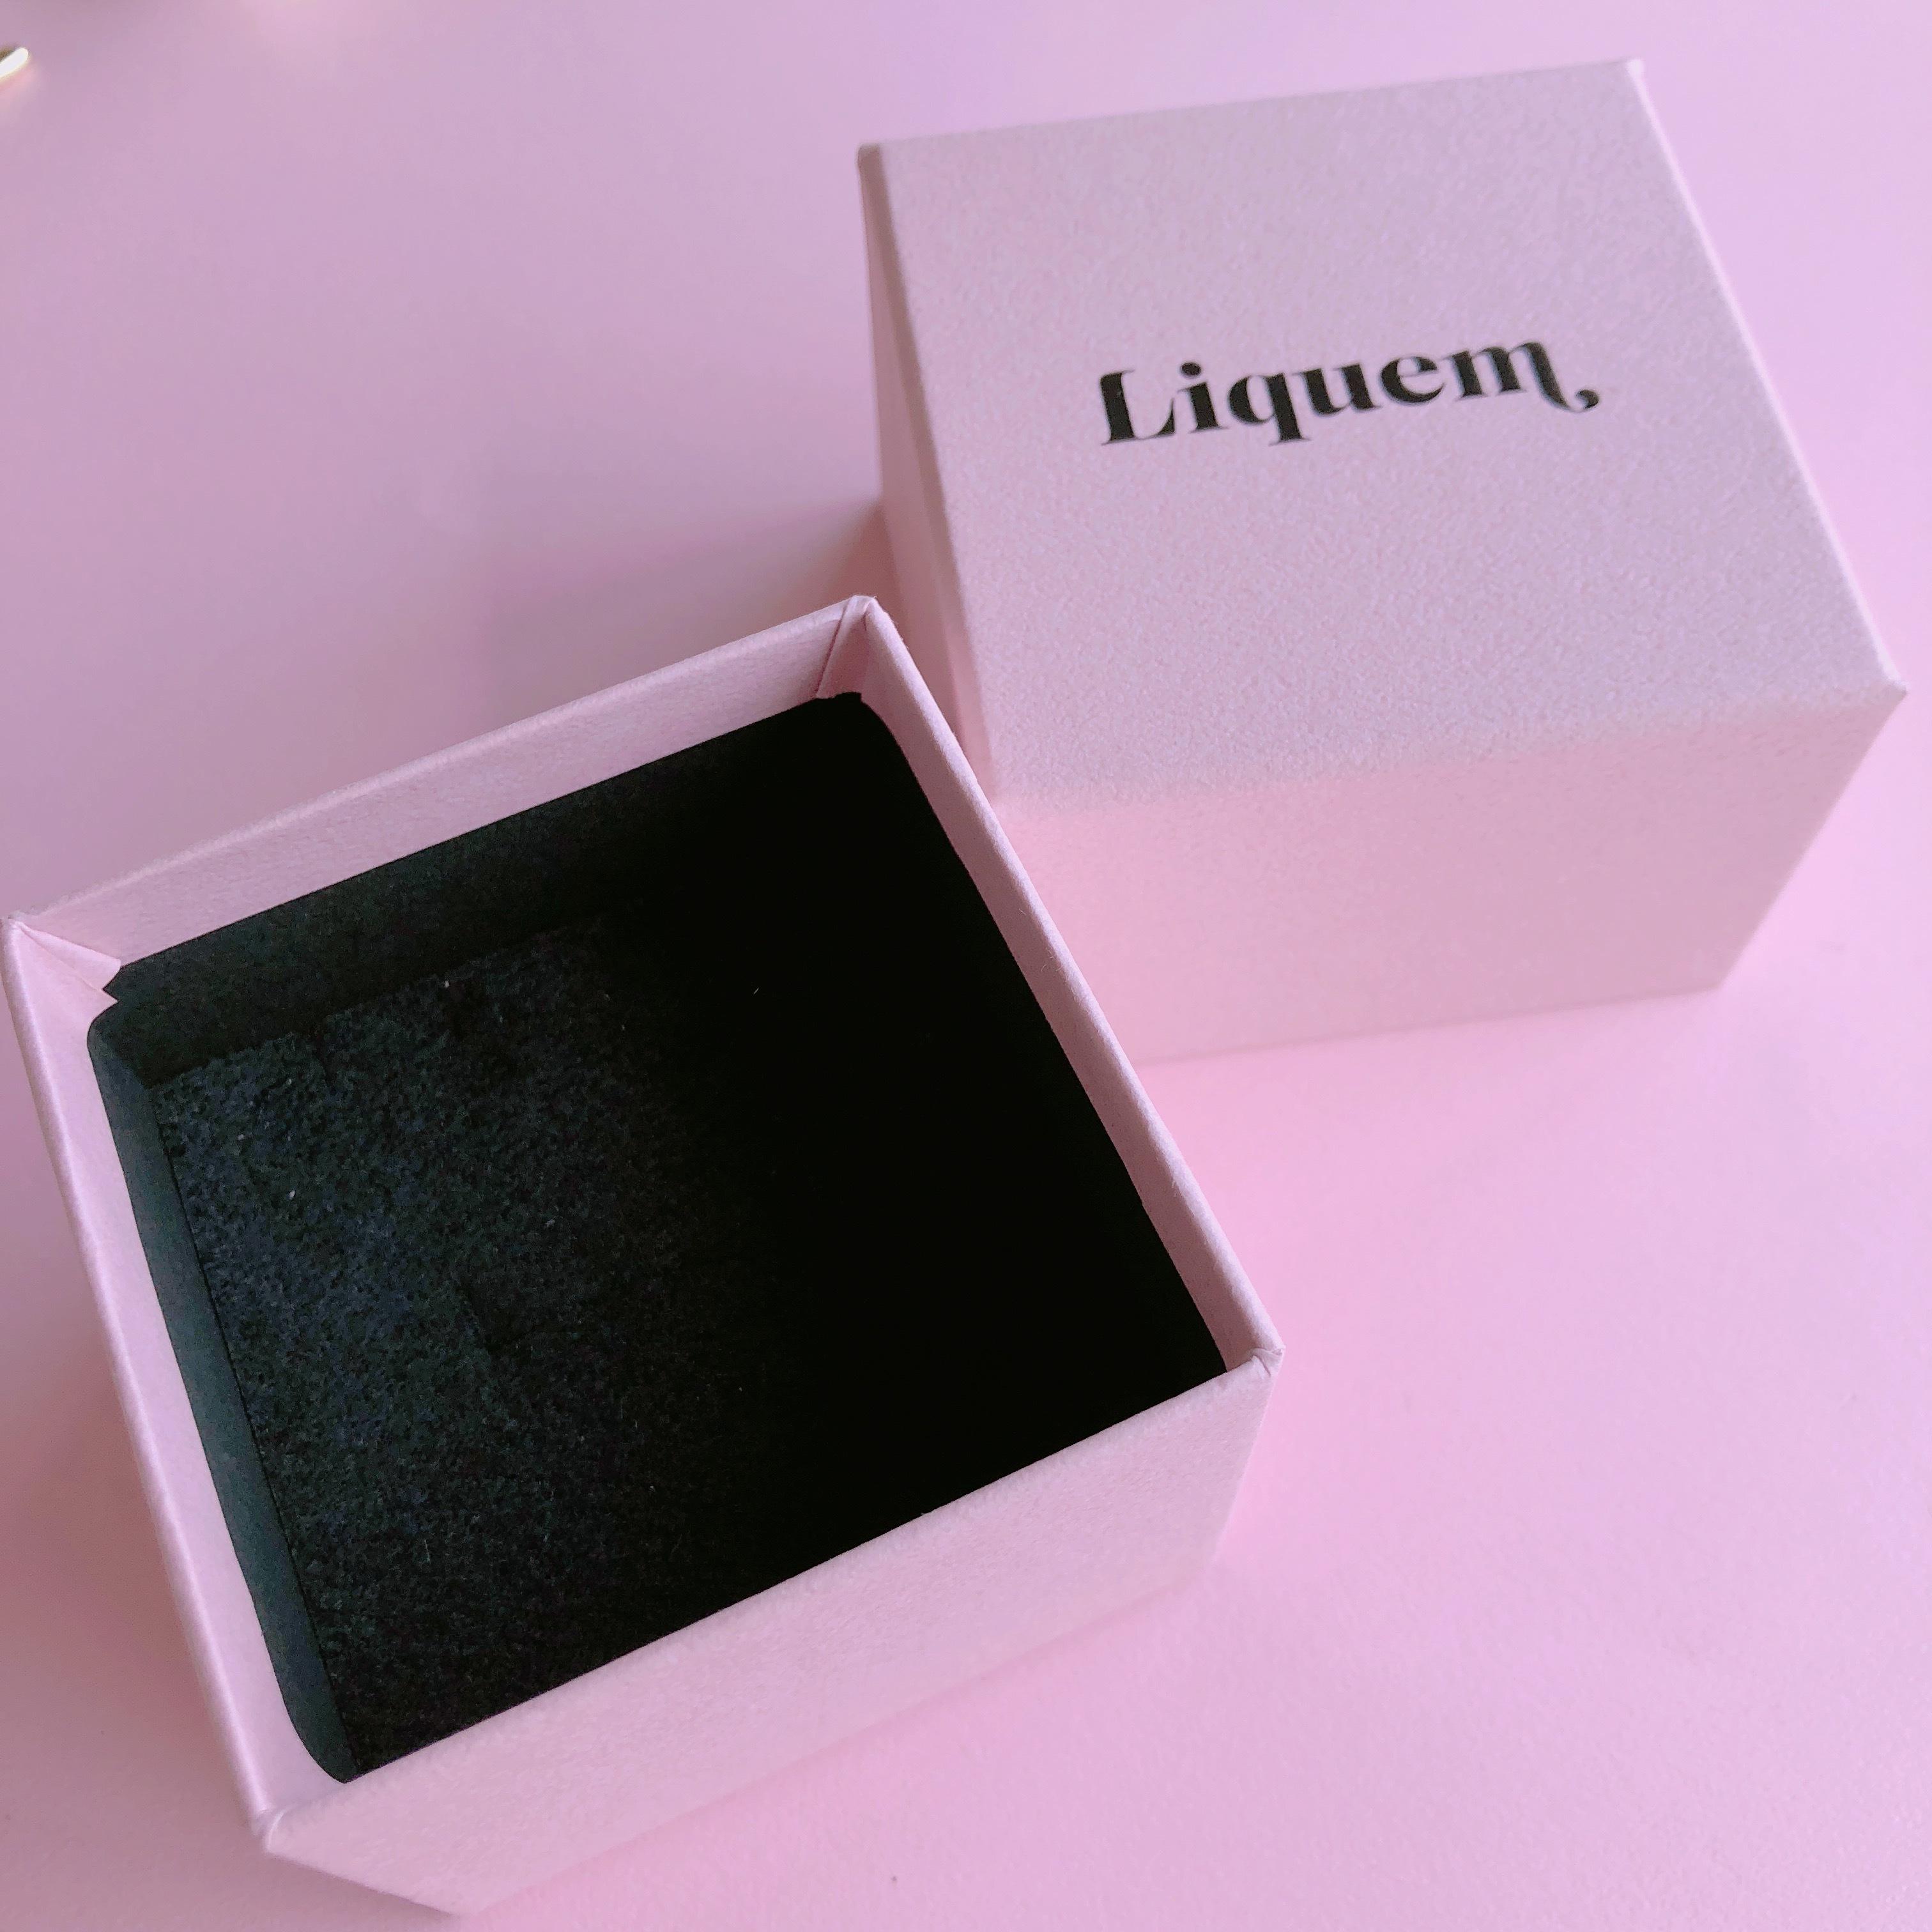 Liquem / ギフトBOXセット (ピンク)